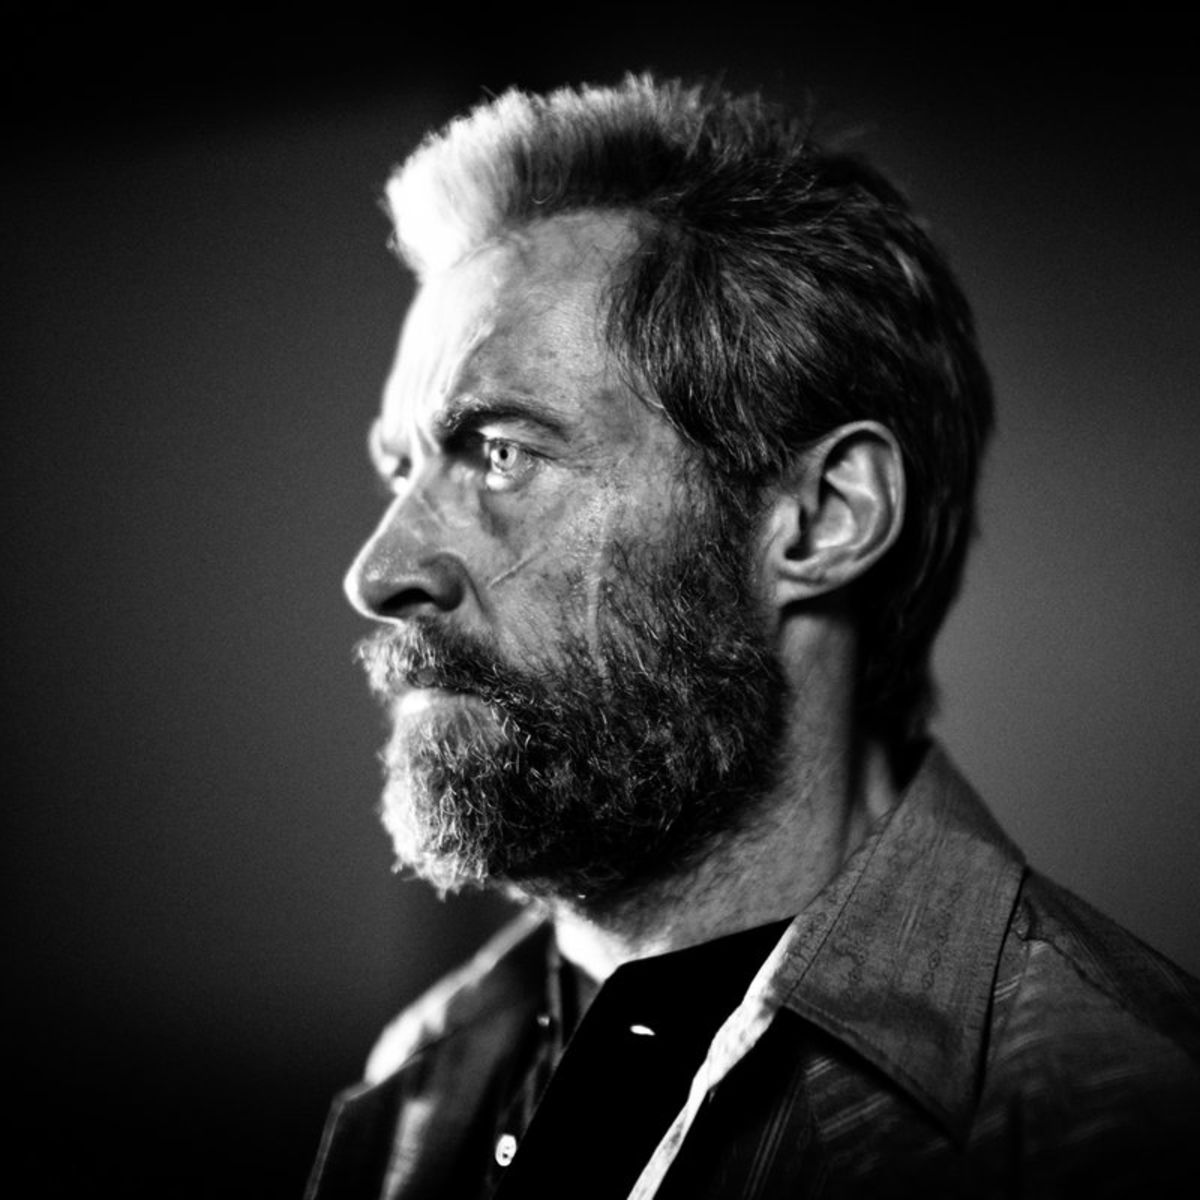 Logan-Hugh-Jackman-image.jpg